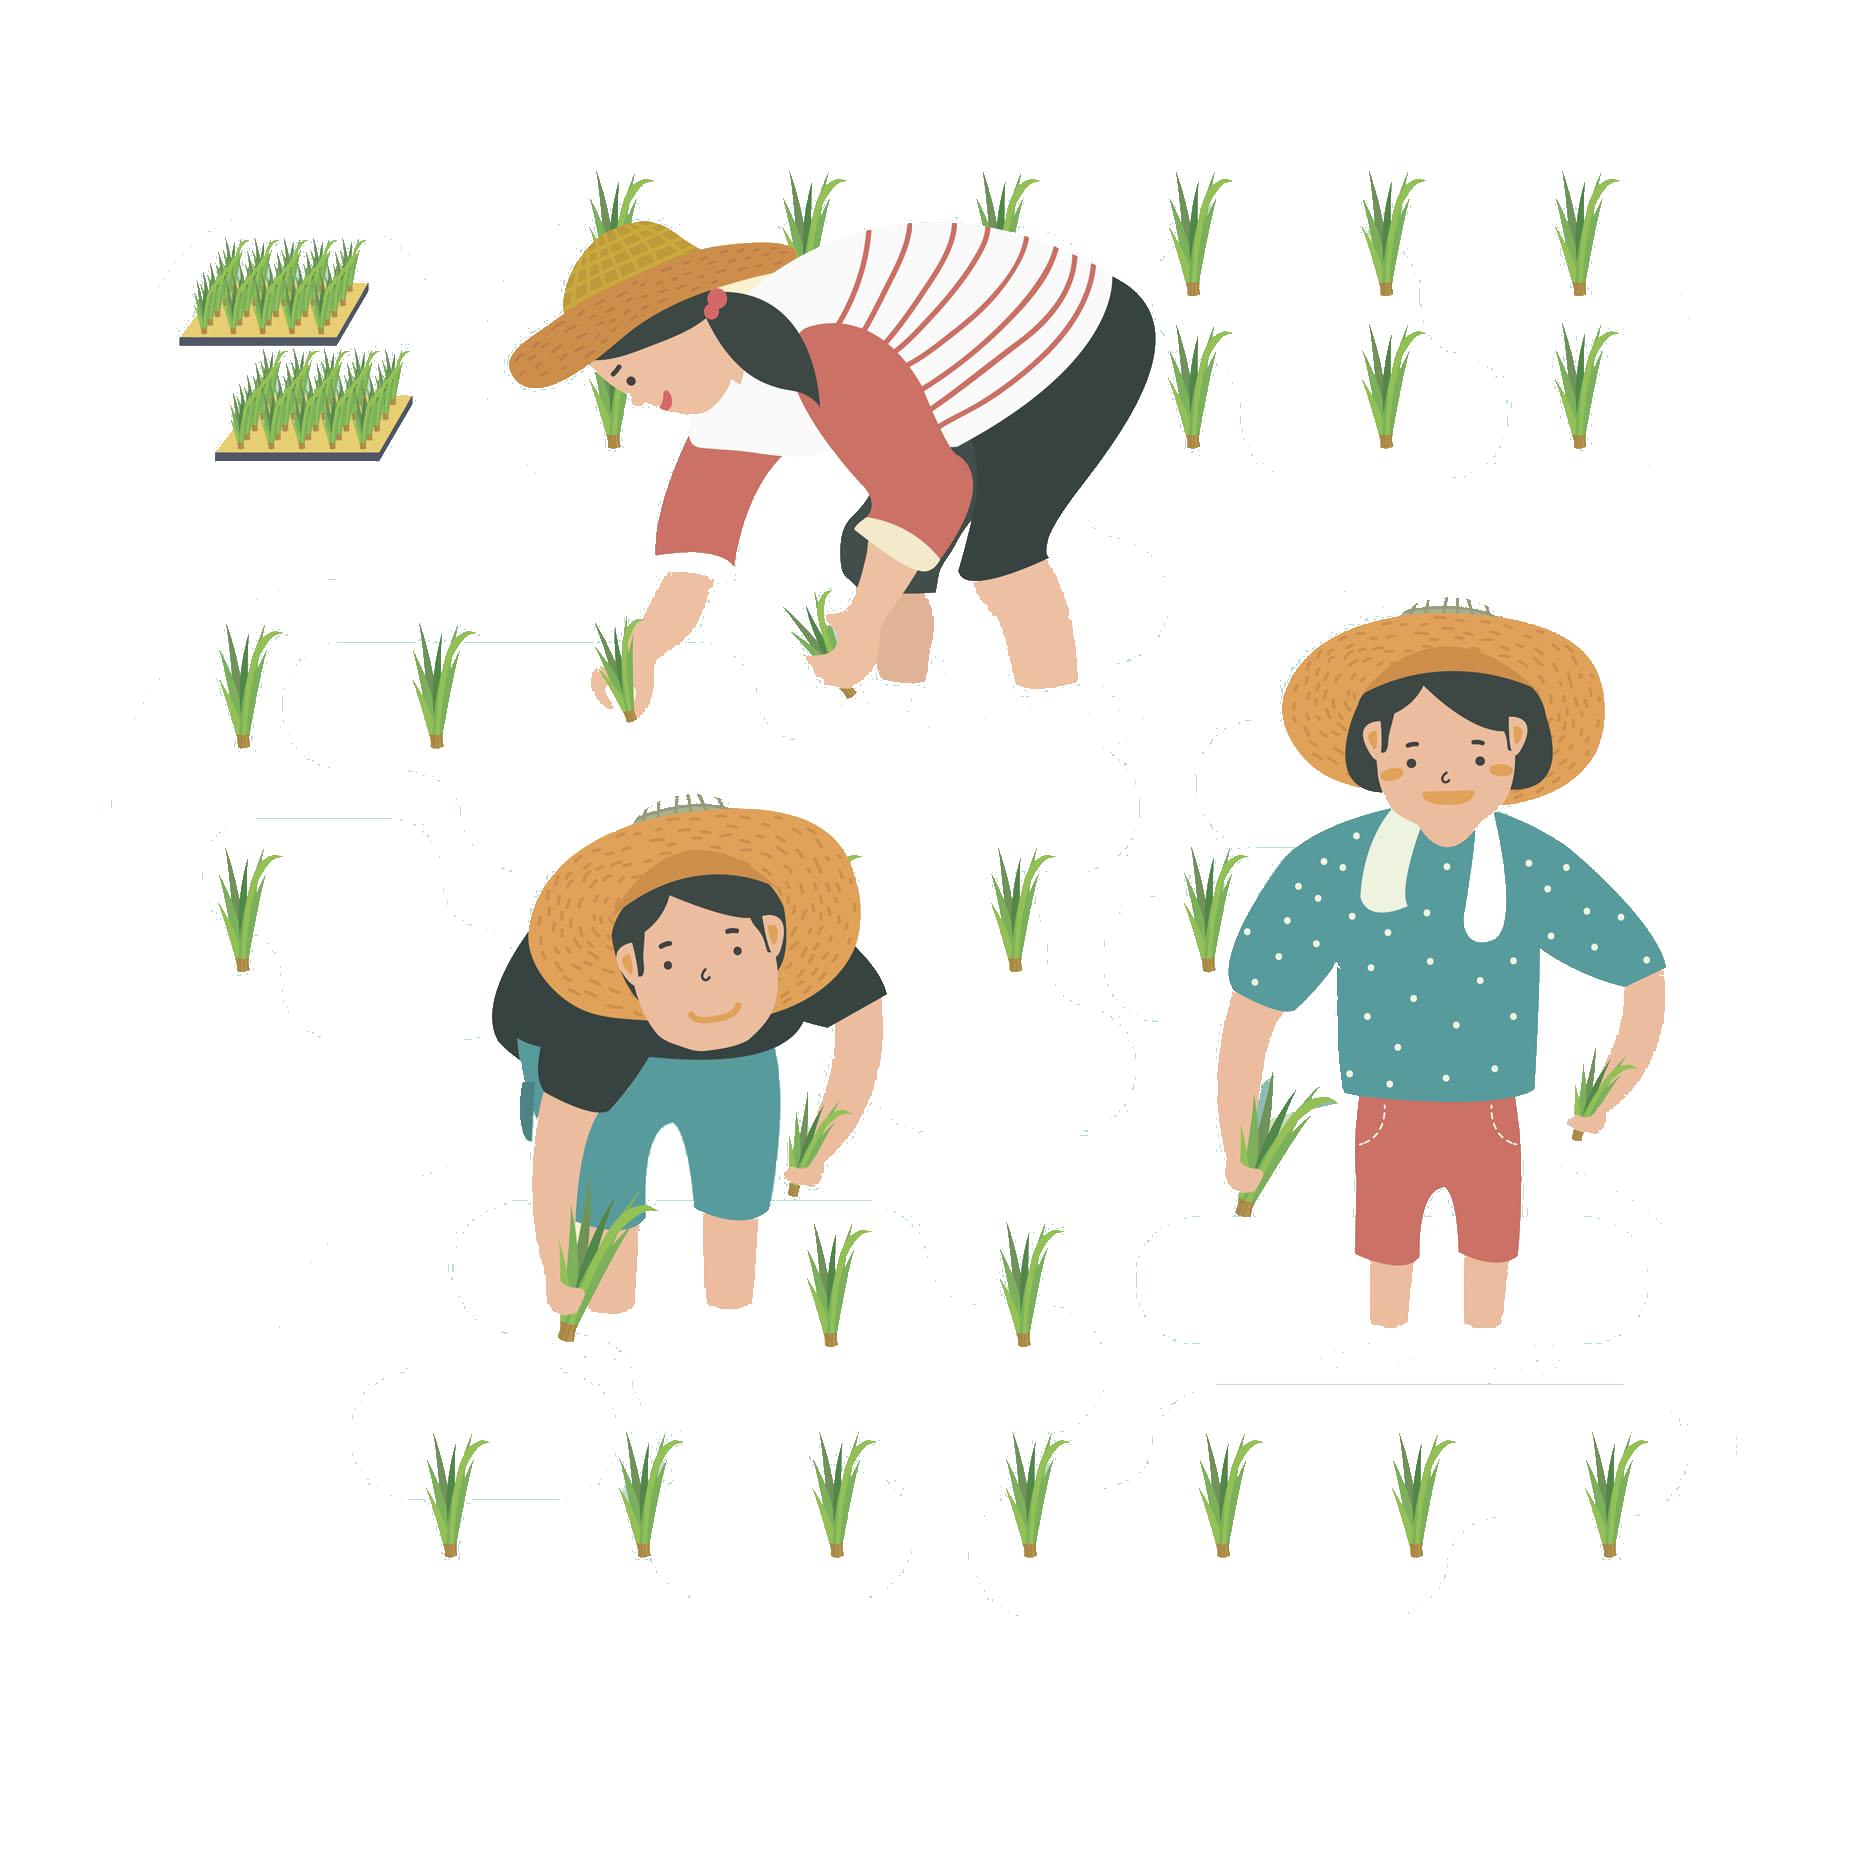 Transplanter uaddubbdubducbubbcuduccuadubacucd agriculture transplanting. Farming clipart rice farmer